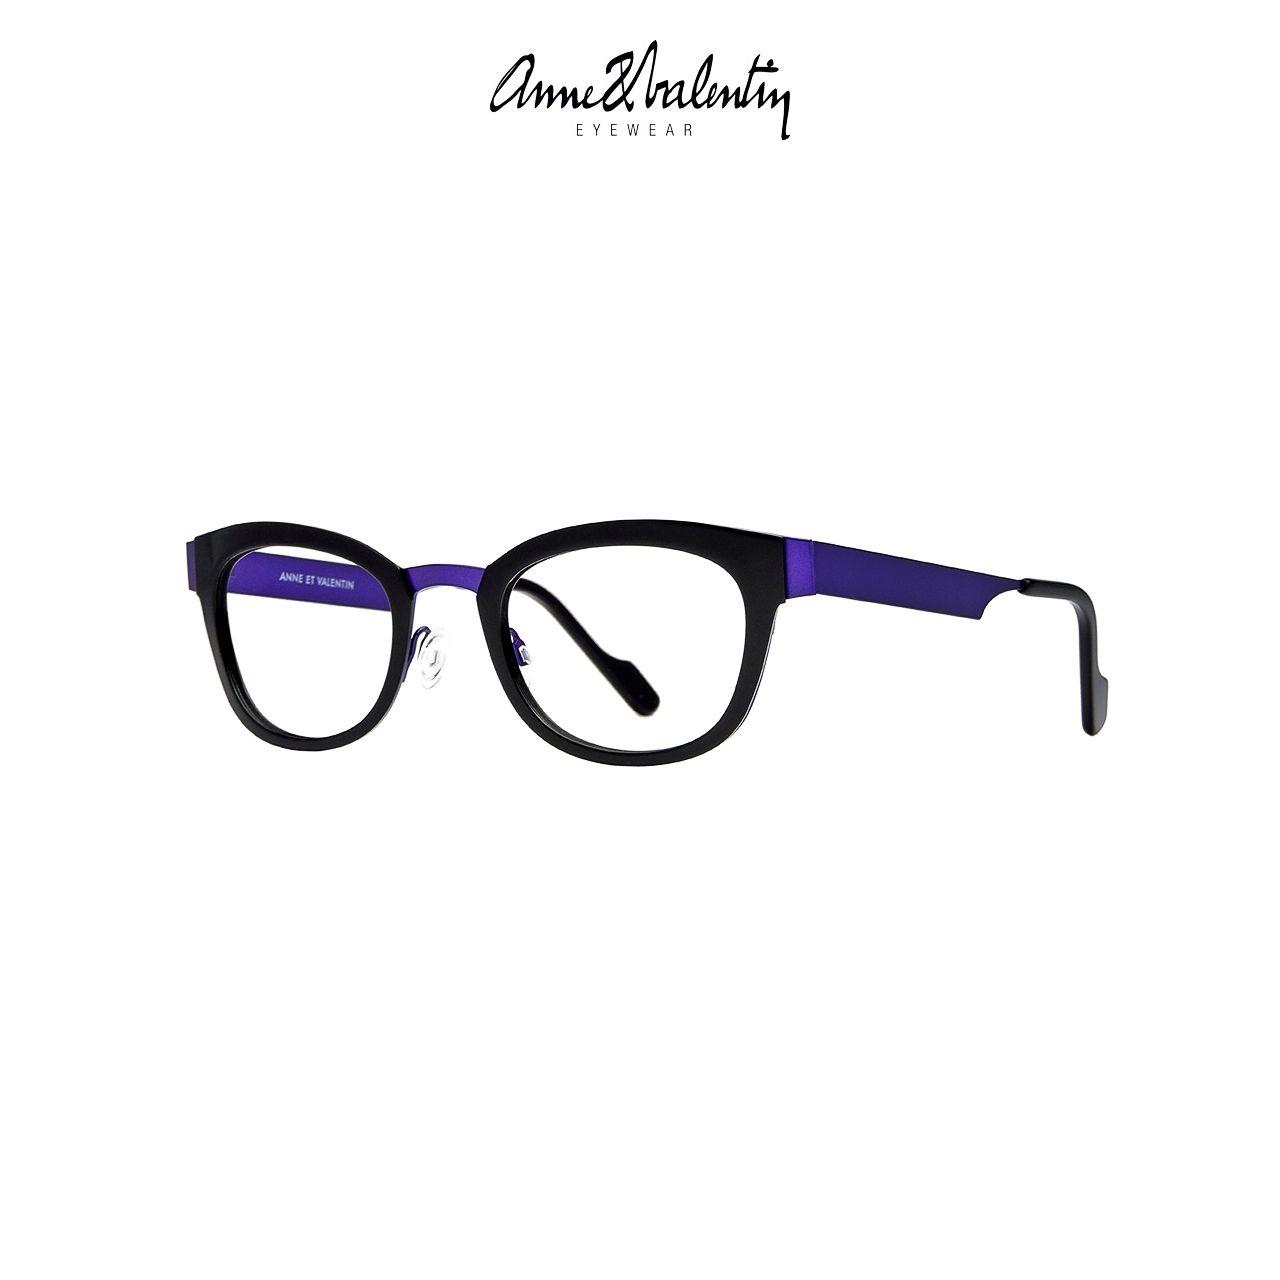 639b41fb506d Anne et Valentin FEDORA frames at Risi Optique